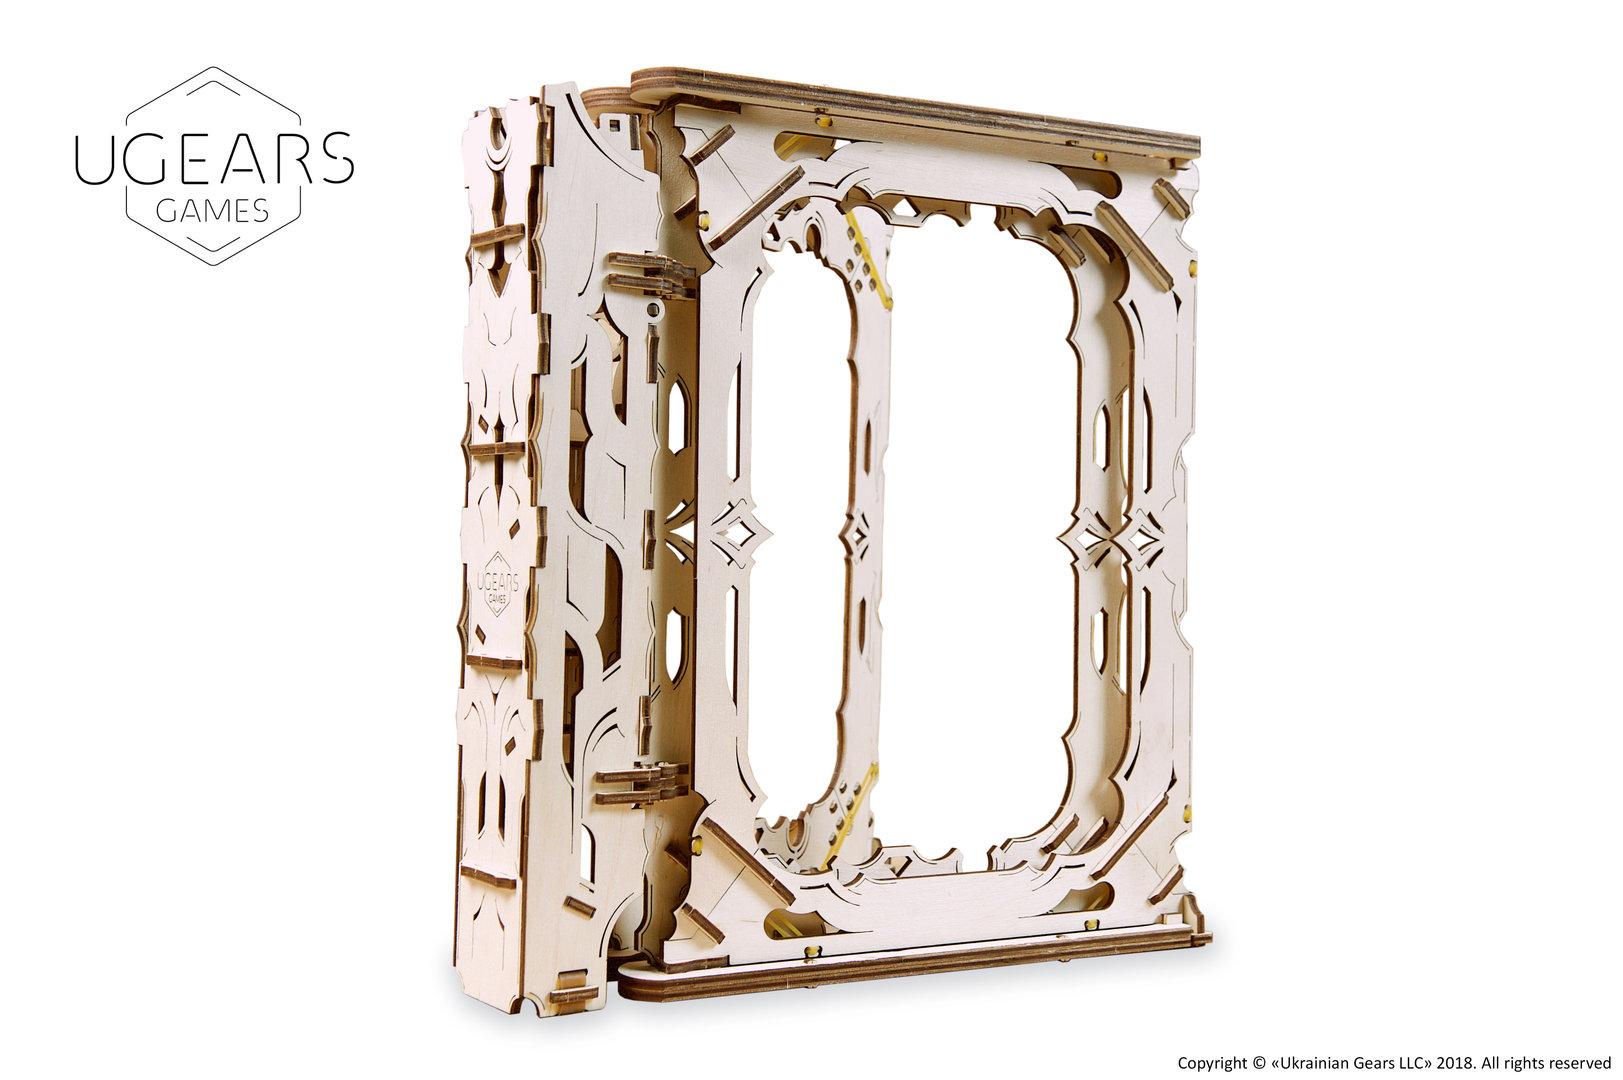 UGEARS Spielleiterschirm mechanische Bausatz Modell